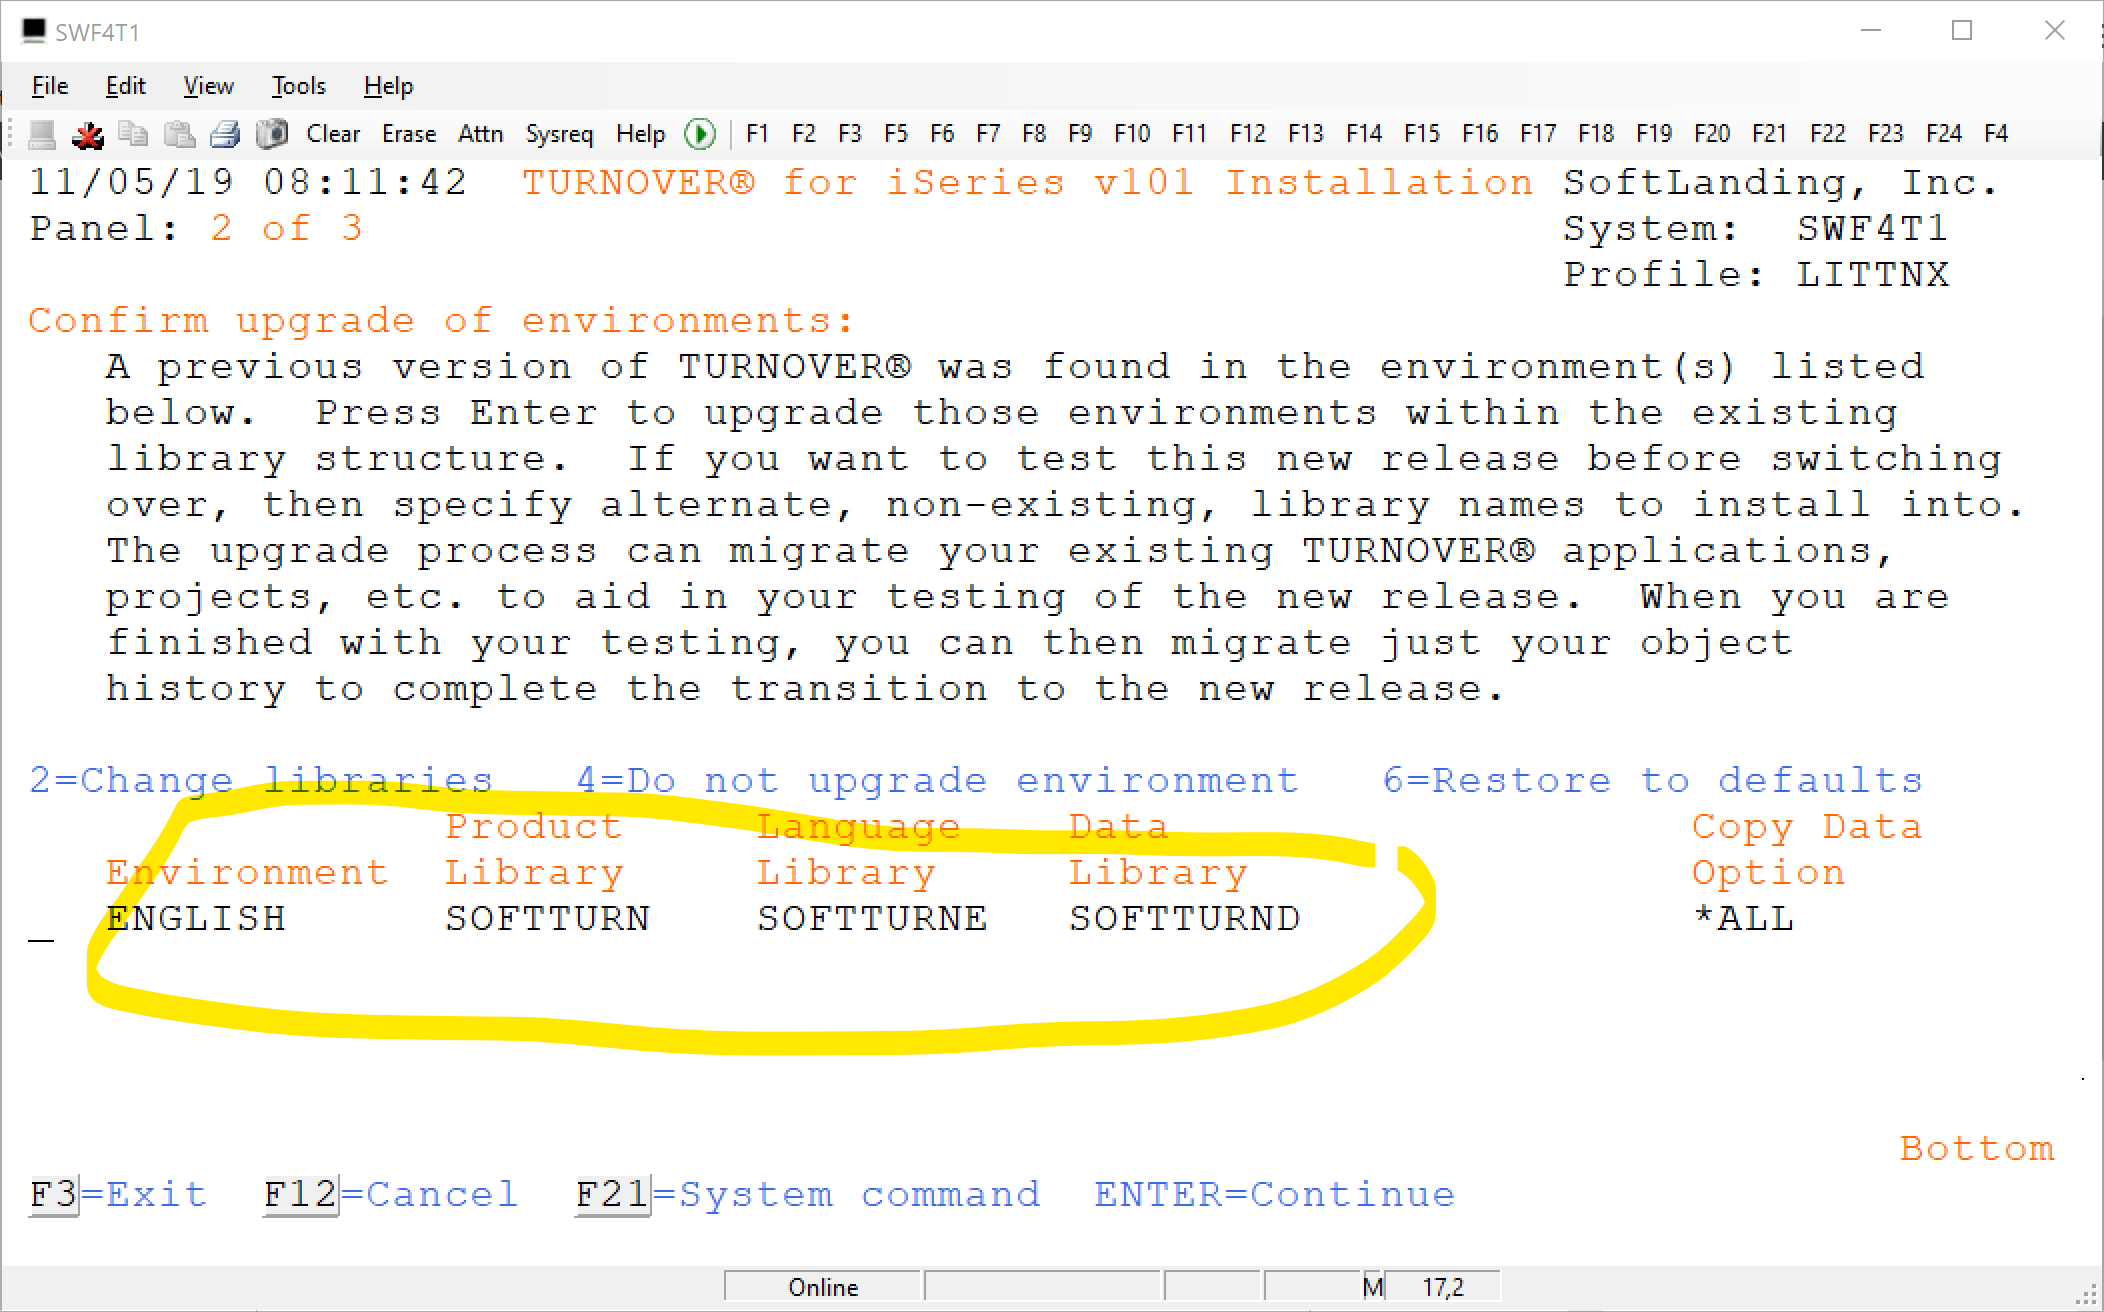 confirm upgrade turnover environment